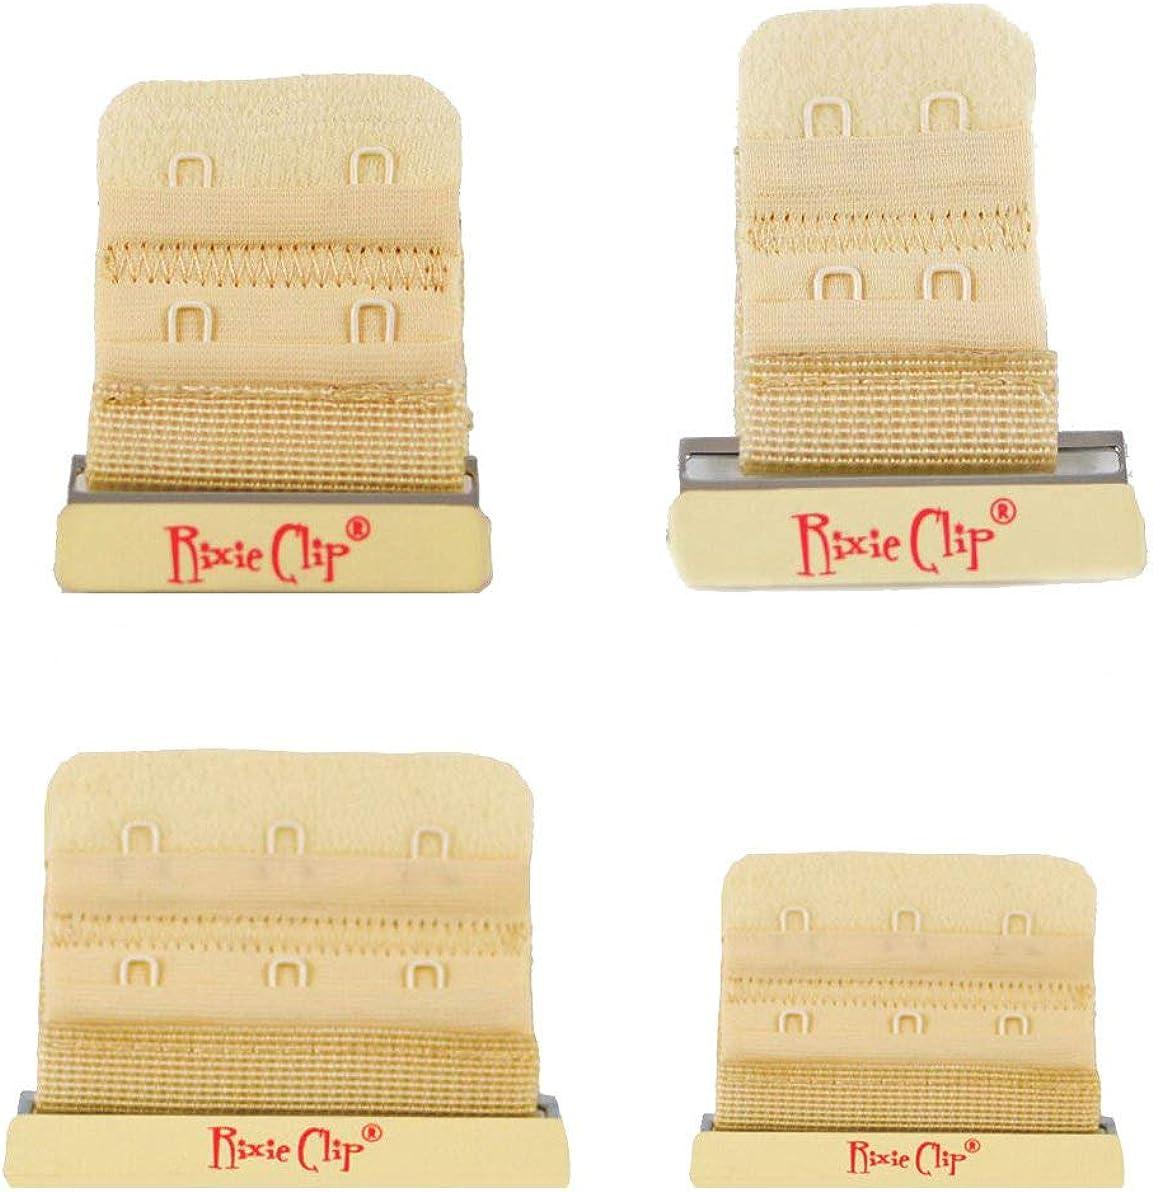 Single Pack Rixie Clip Bra Band Tightener RC